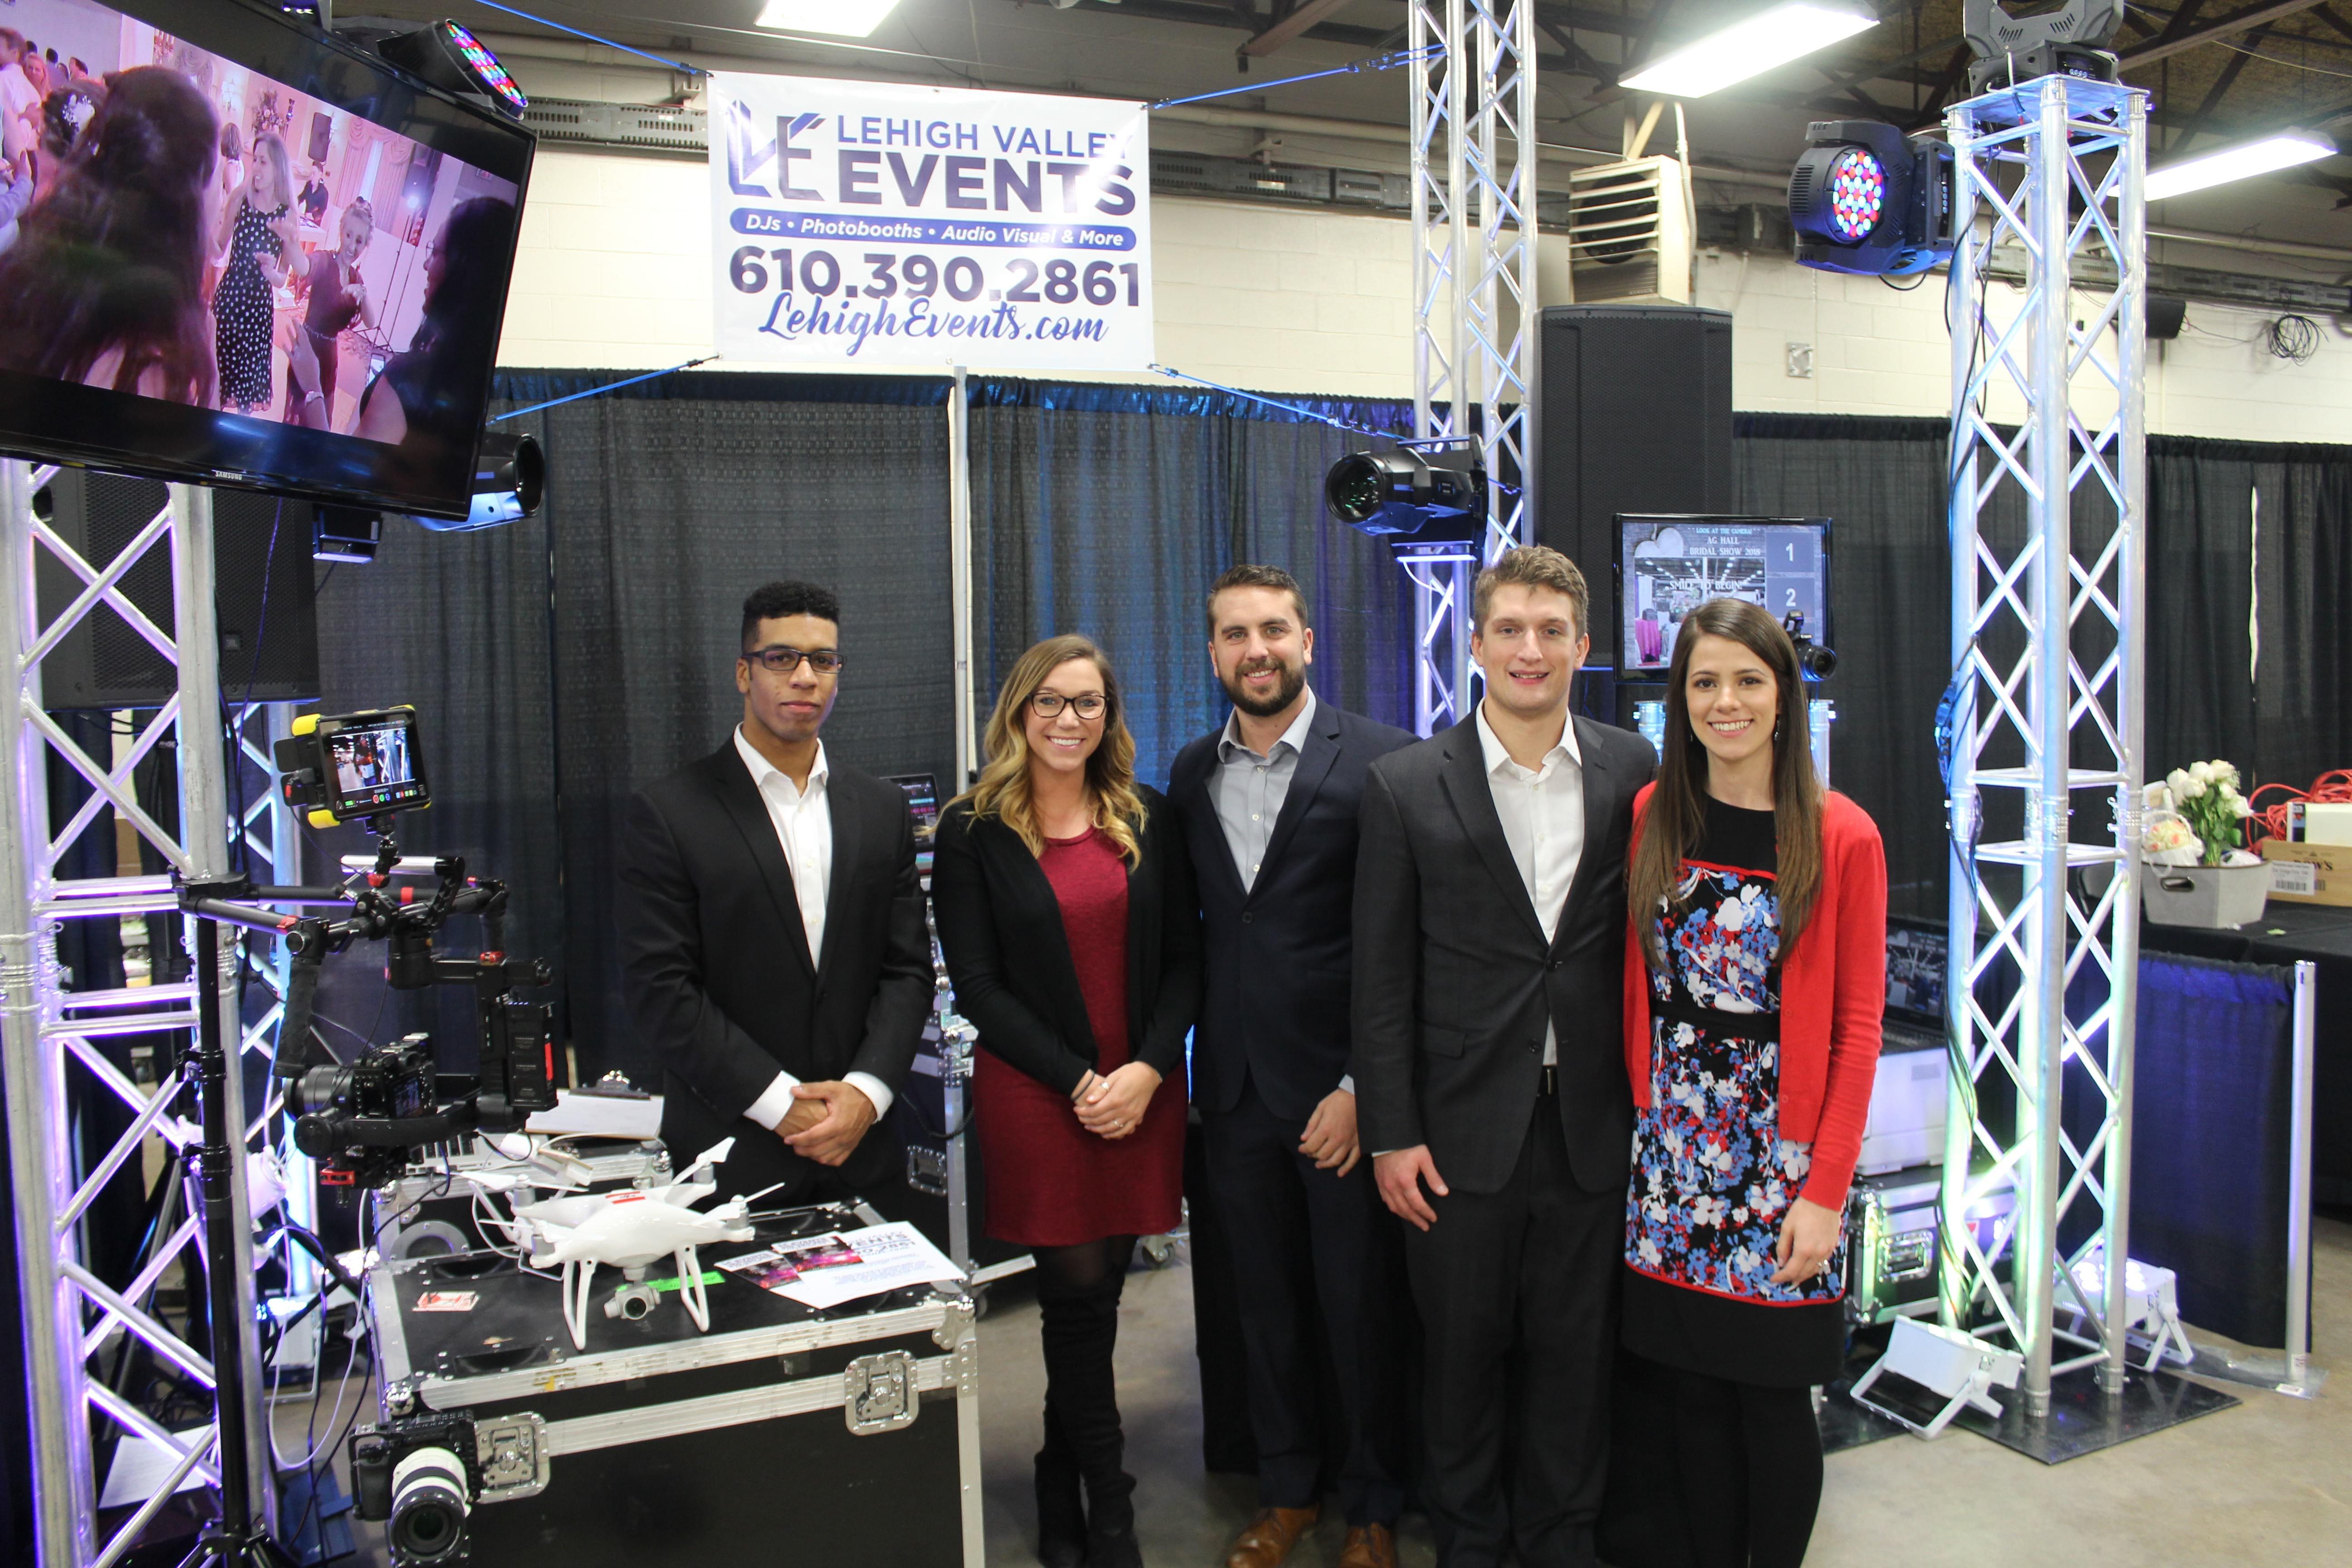 Lehigh Valley Events DJ Staff